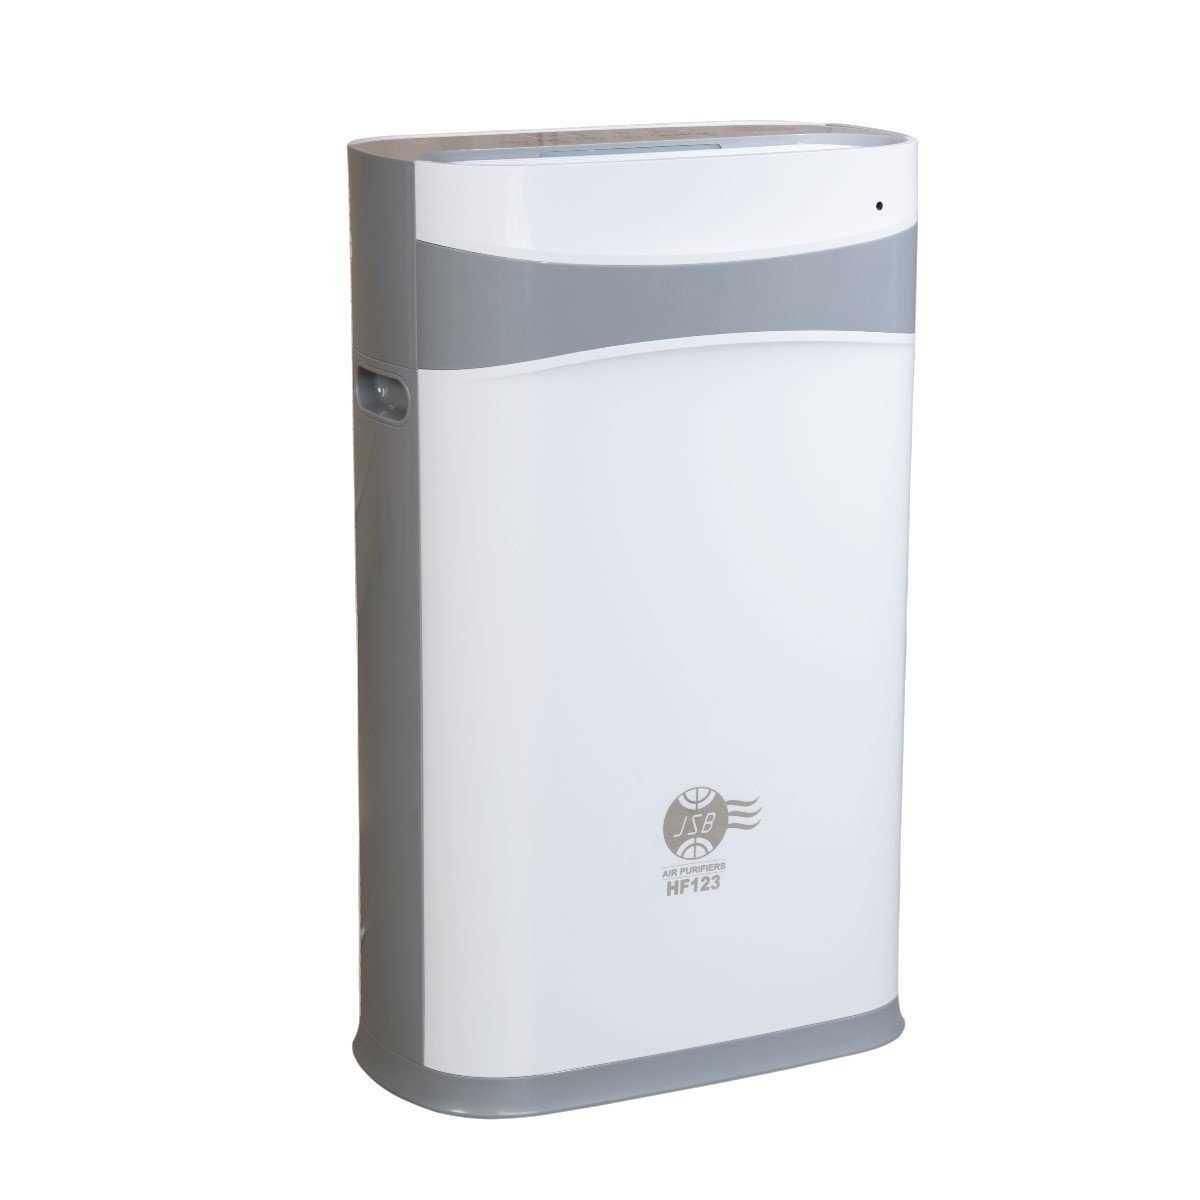 JSB HF123 Room Air Purifier